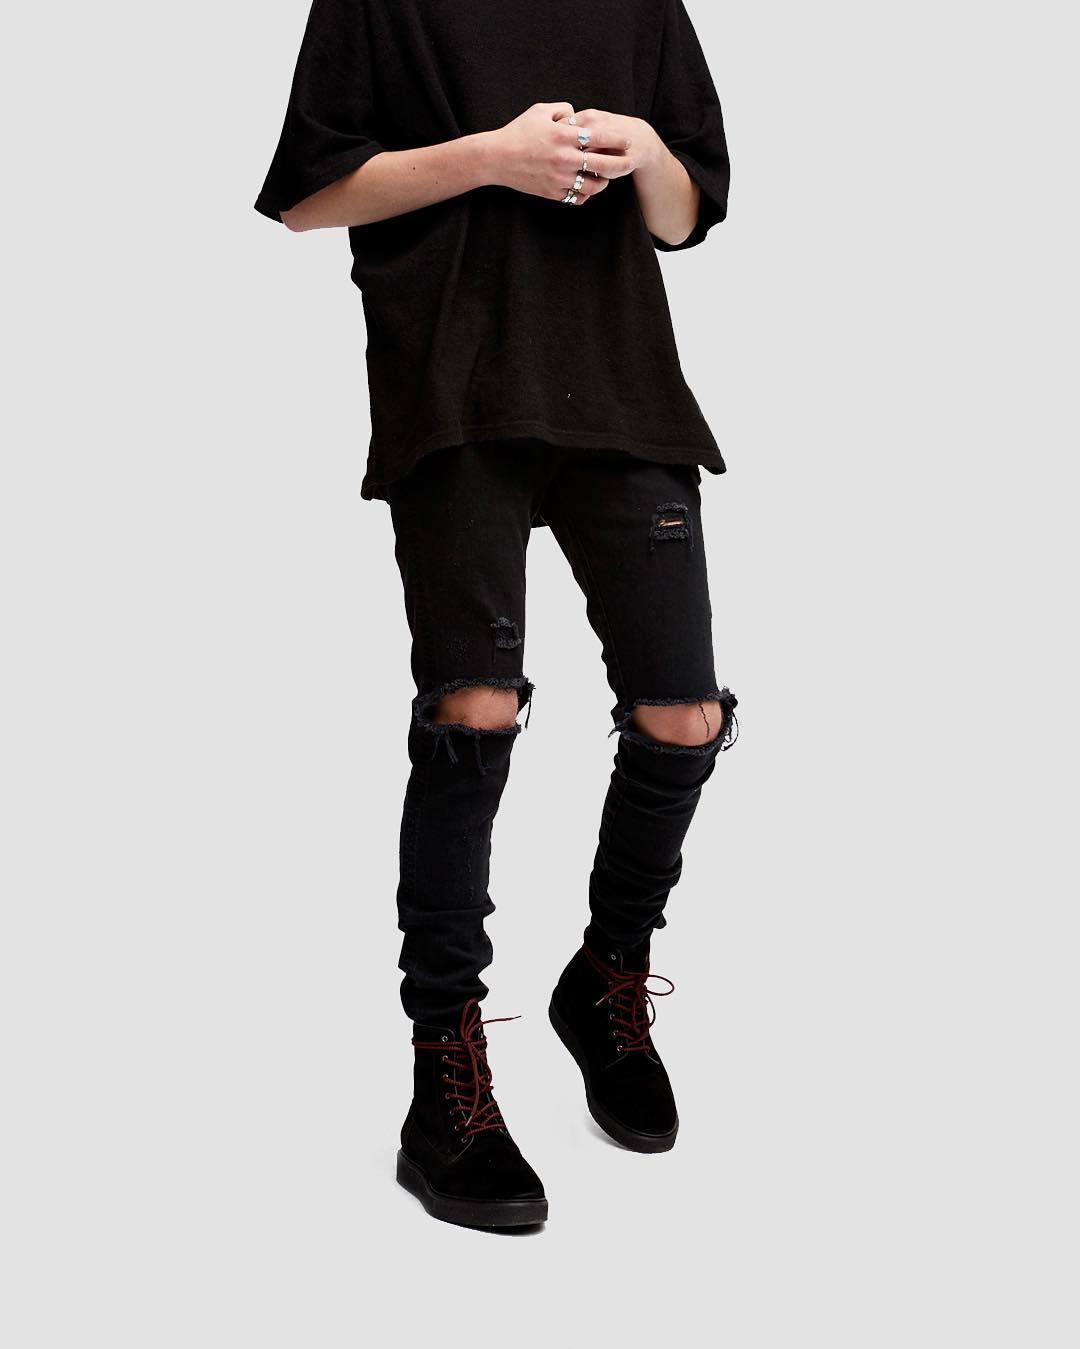 Denim Jeans Pantalons Hommes Destroyed Hip Hop Holes Ripped Denim Noir Skinny Jeans Homme Slim Fit Streetwear Biker Jean Haute Qualité